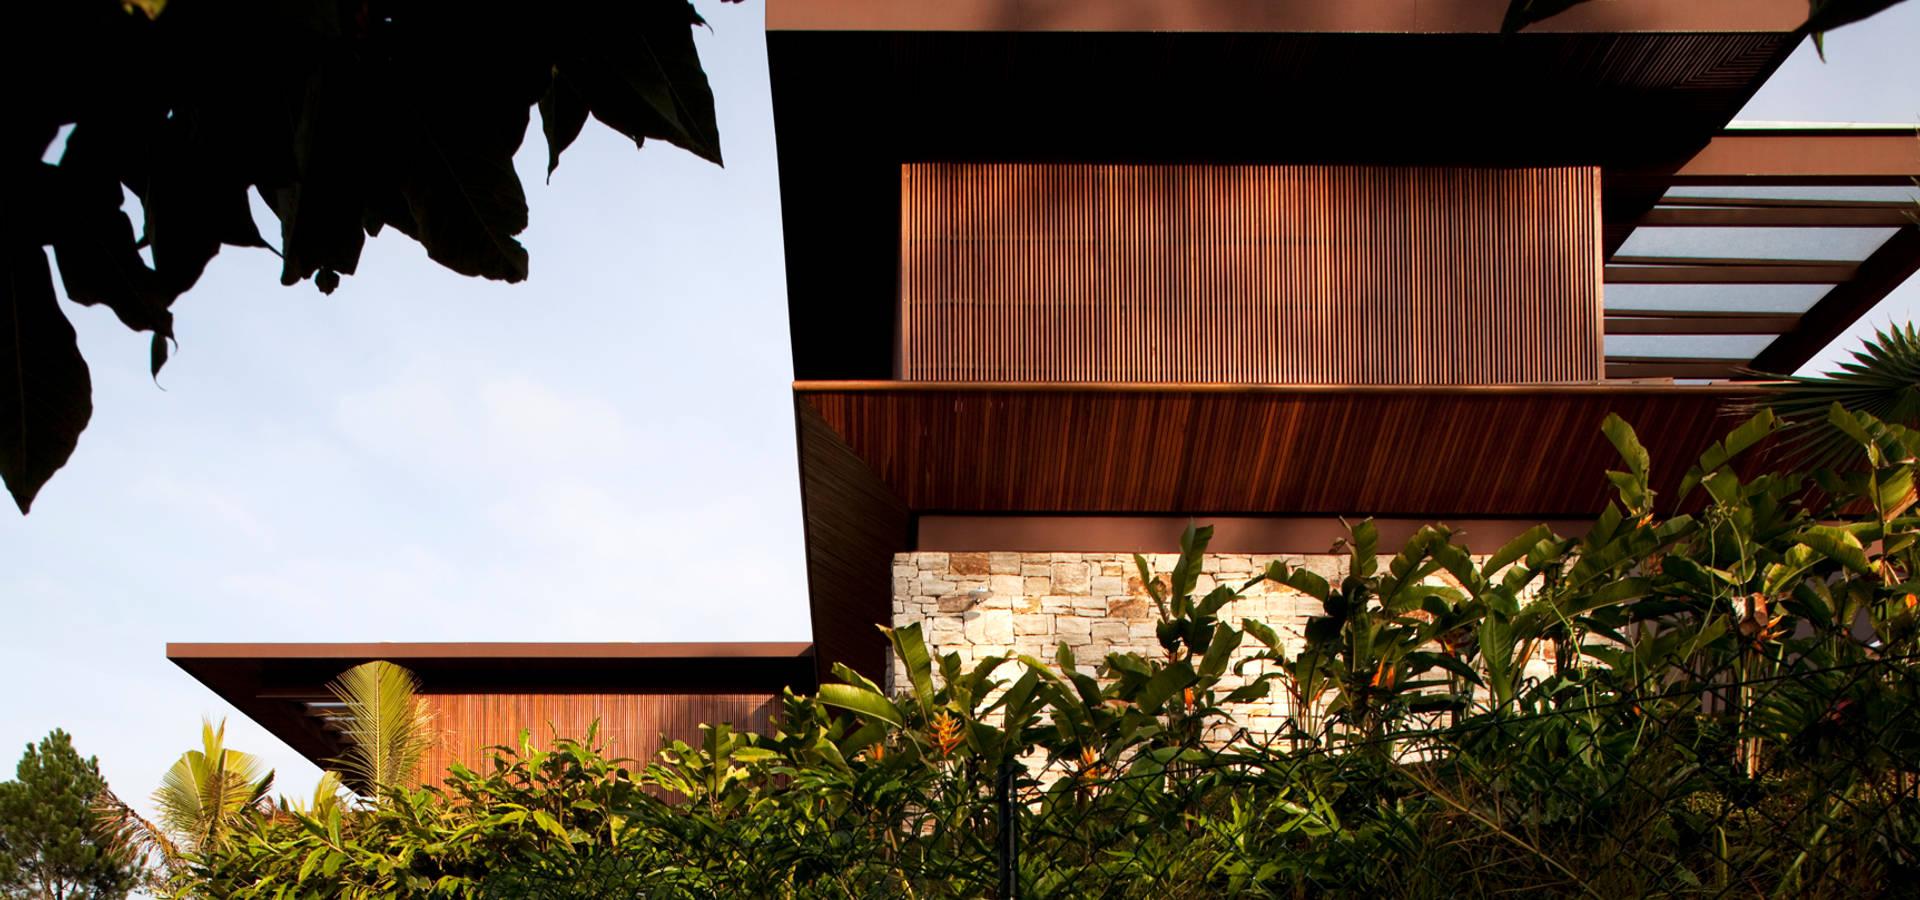 M Kalache arquitetura